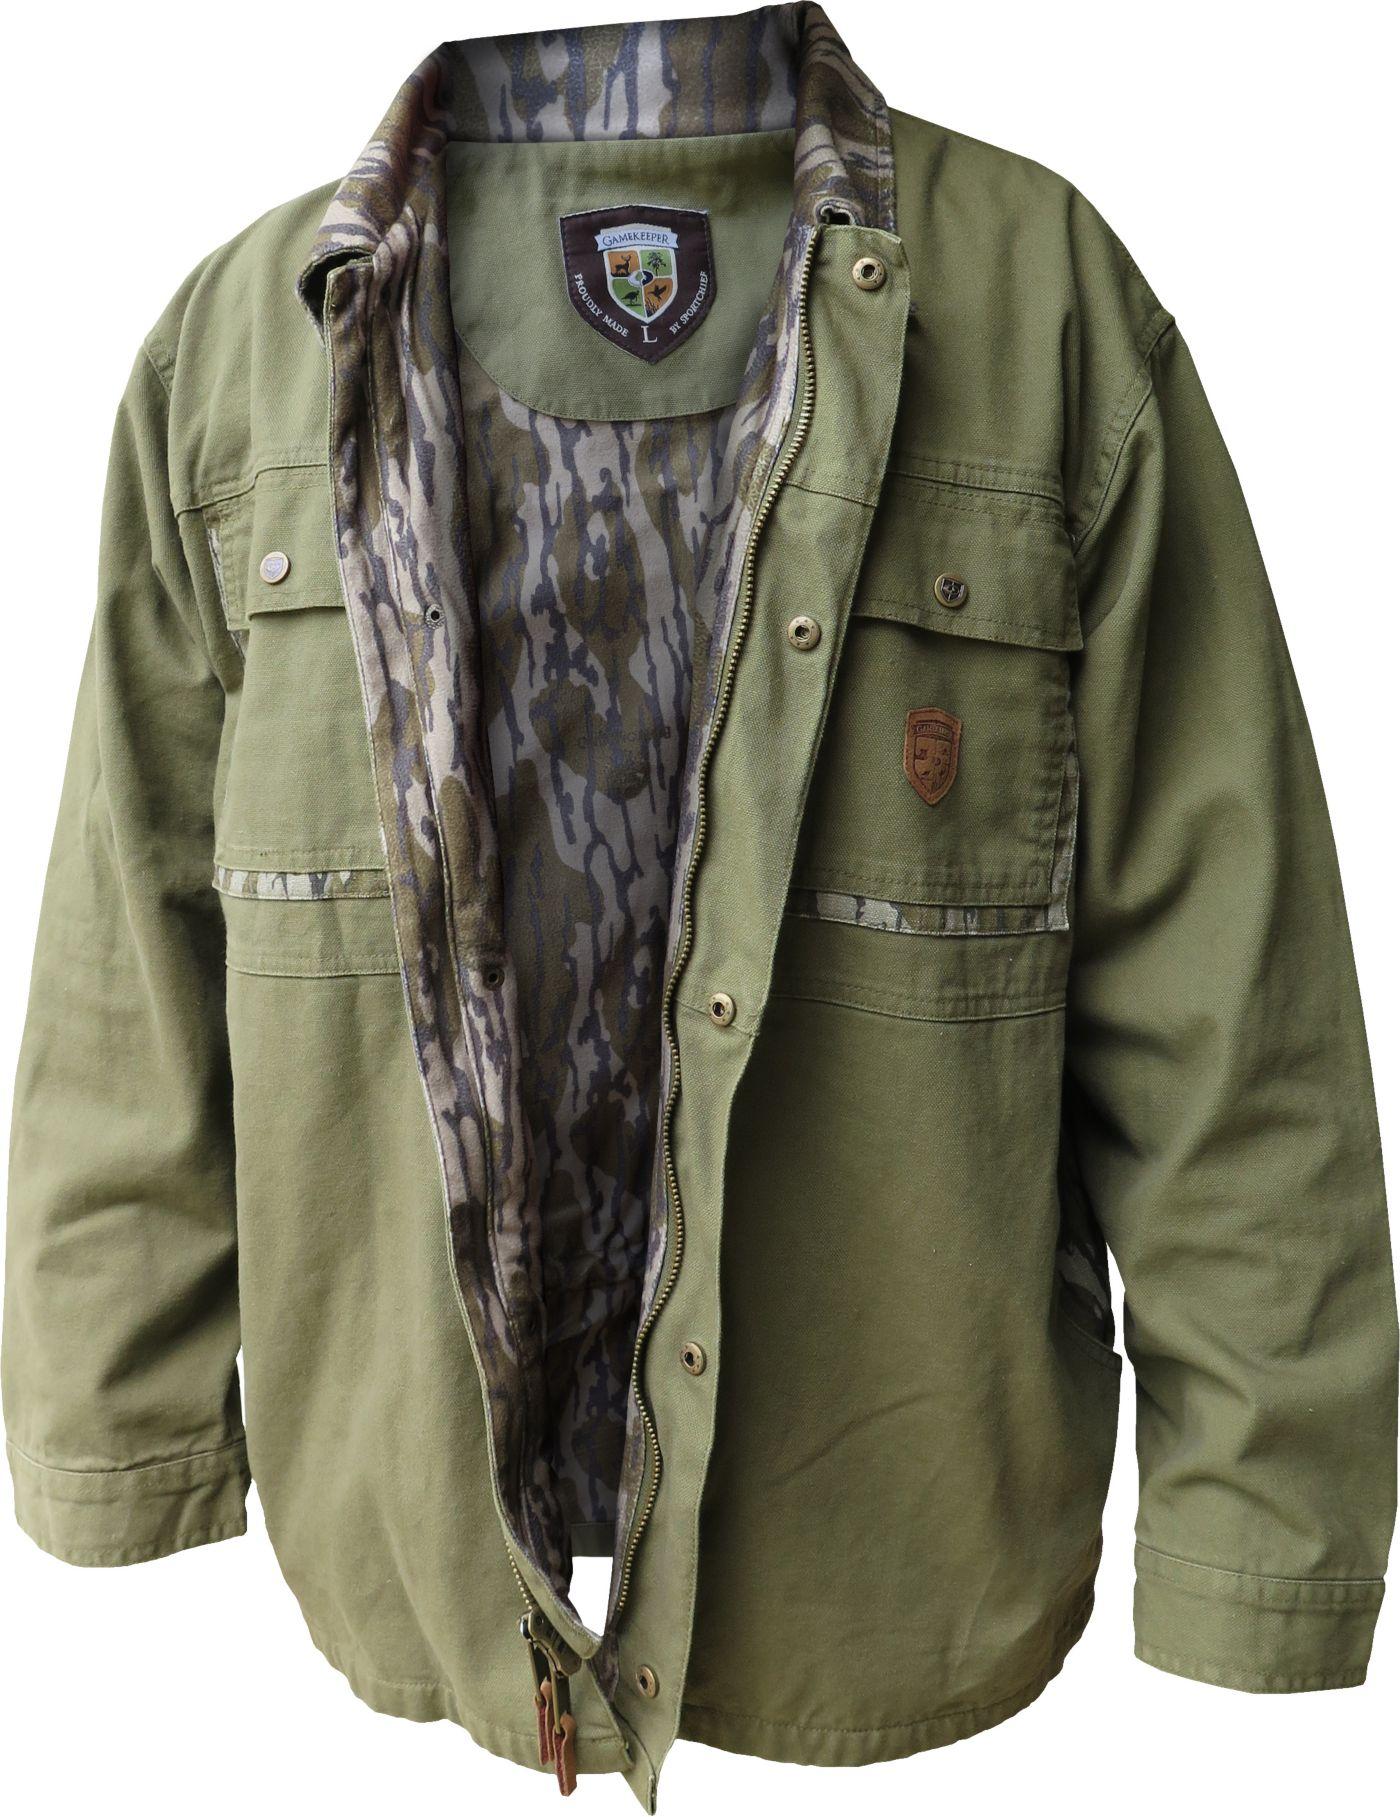 GameKeepers Men's Field Hunting Coat